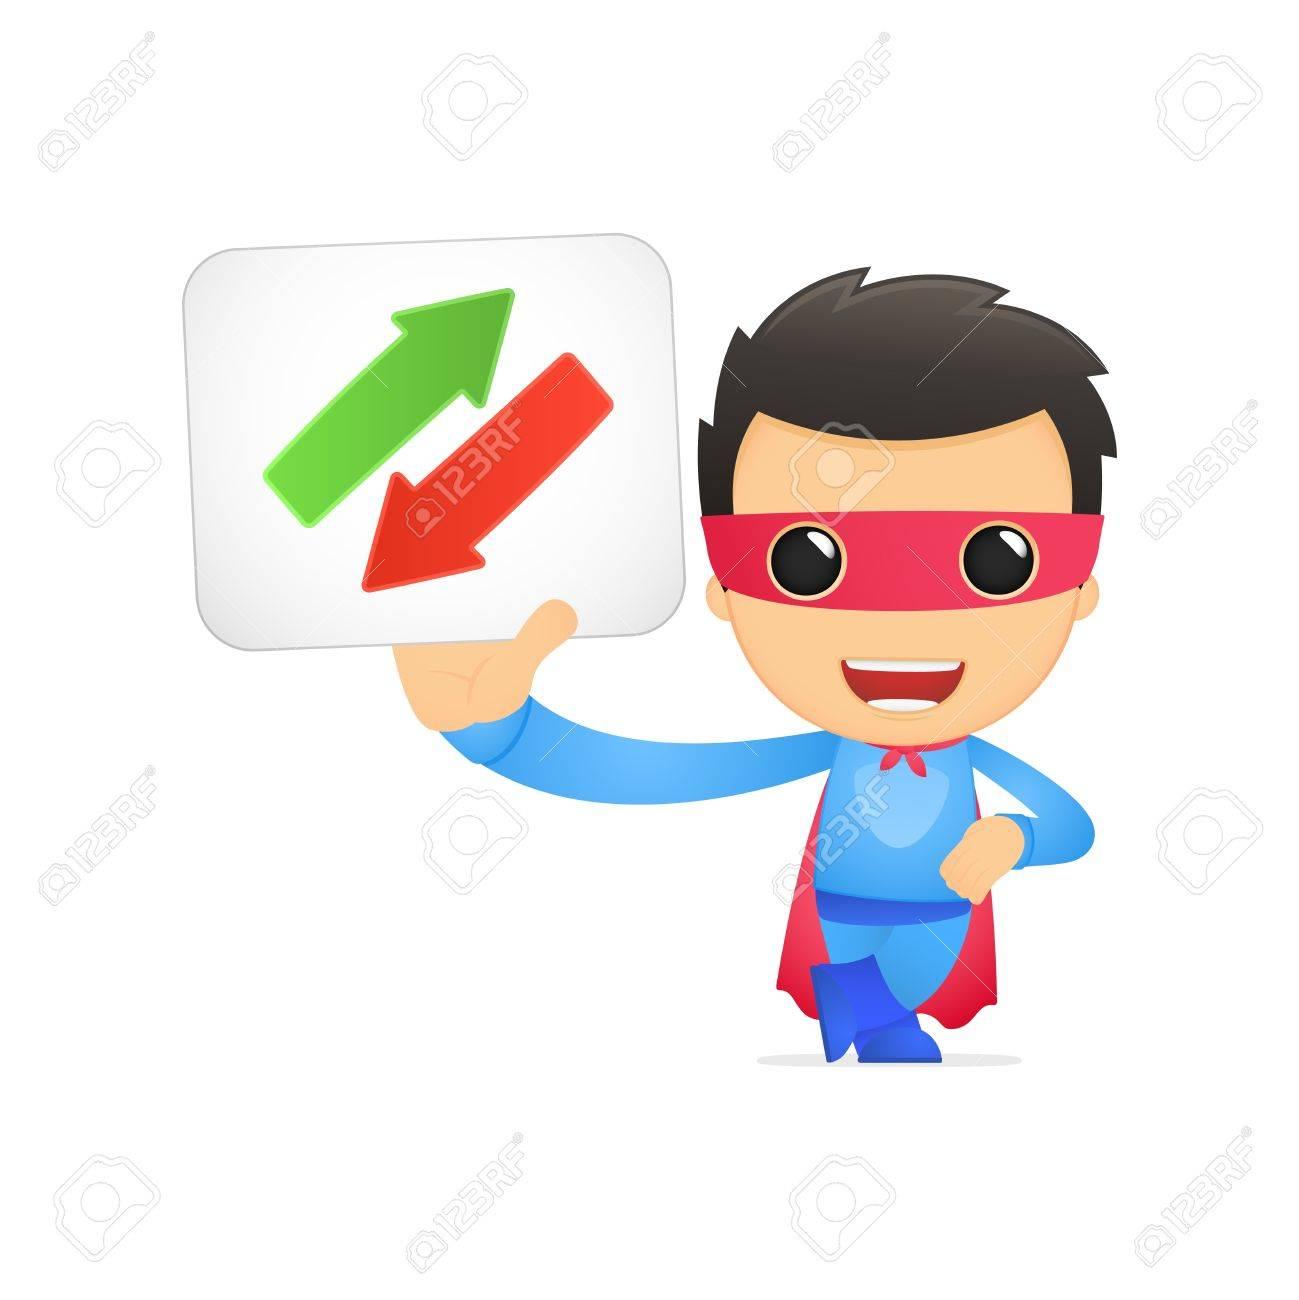 funny cartoon superhero Stock Vector - 13890345